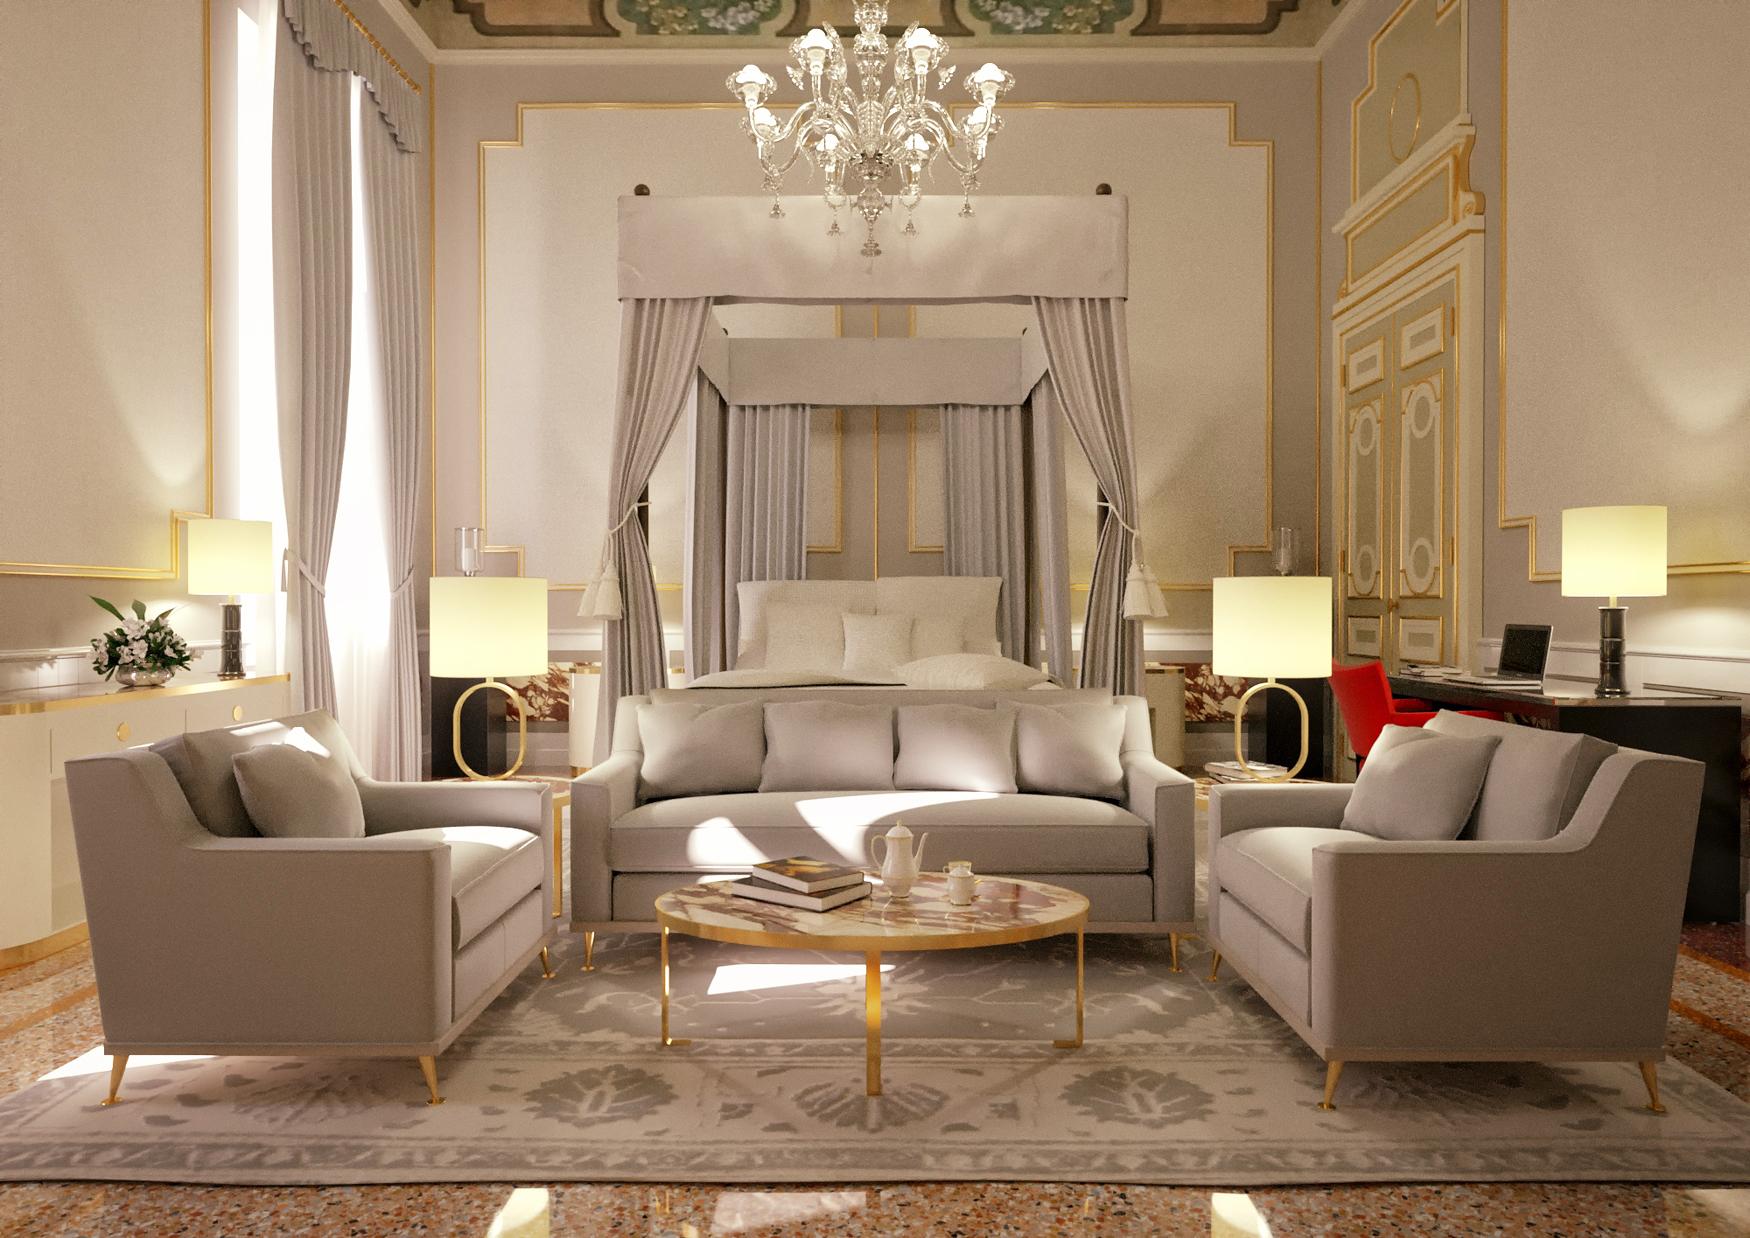 Ldc group to open new hotel in venice ldc italian hotels for Hotel design venice